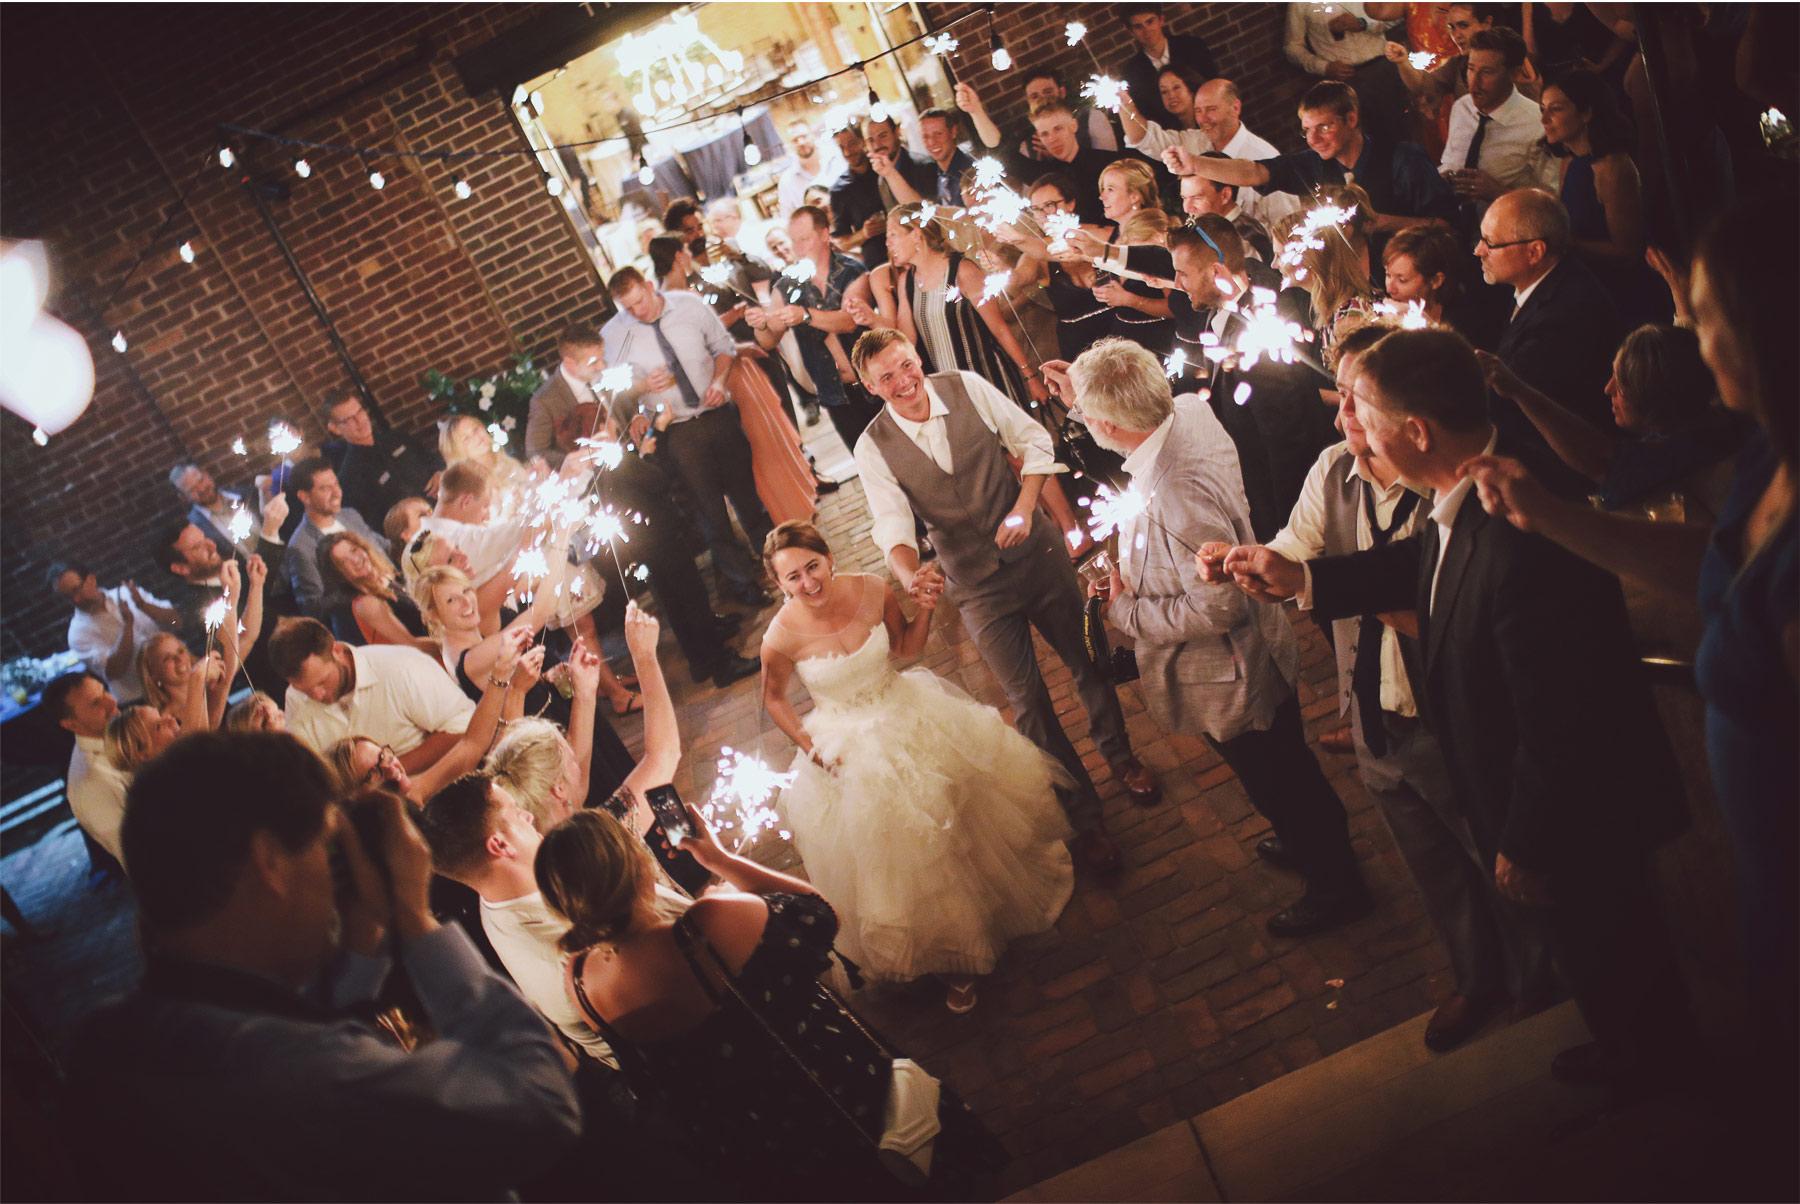 25-Minneapolis-Minnesota-Wedding-Photography-by-Vick-Photography-The-View-Minneapolis-Event-Center-Reception-Sparkler-Send-Off-Brigid-and-Ernie.jpg